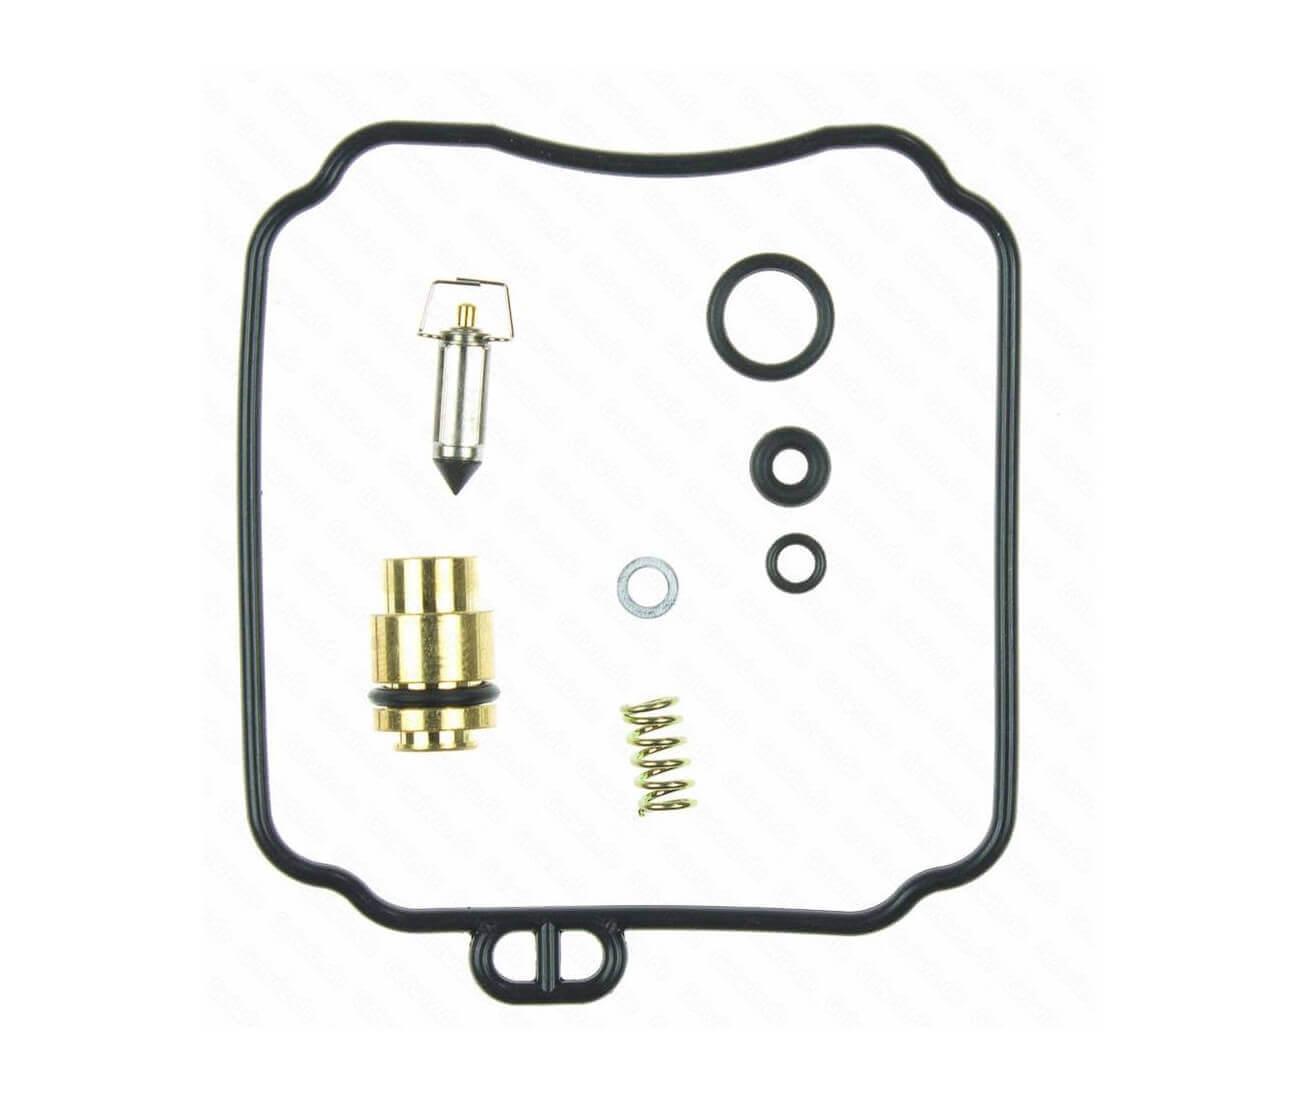 Yamaha Xvs 650 Drag Star Kit Reparation Carburateur Xvs